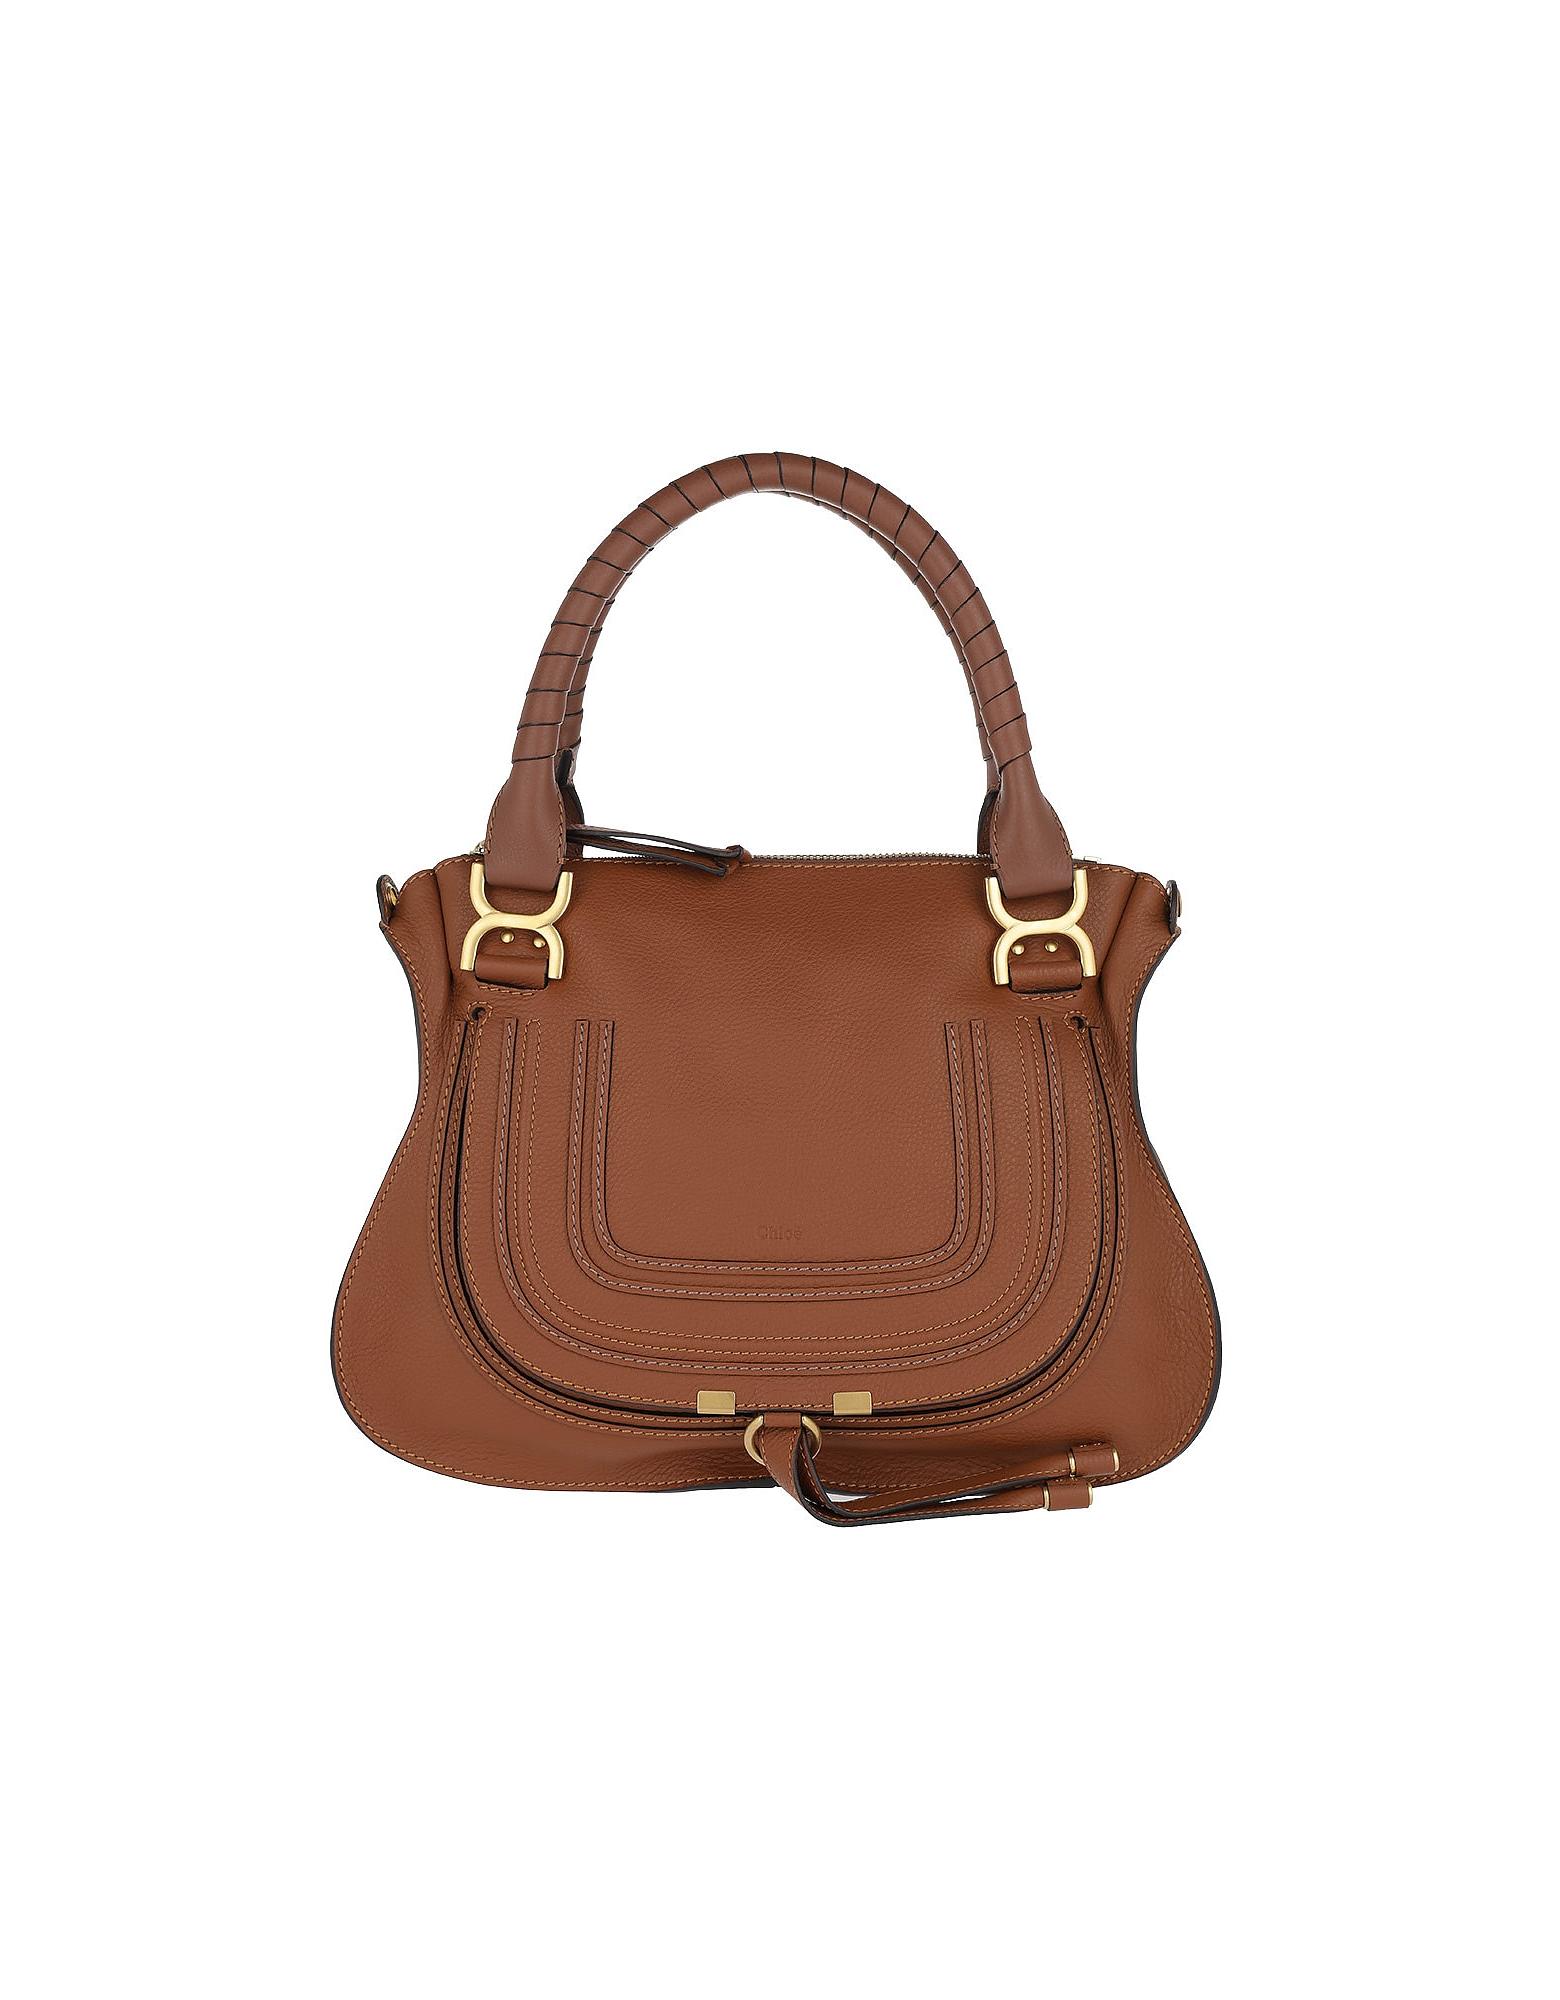 Chloe Handbags, Marcie Medium Shoulder Bag Tan